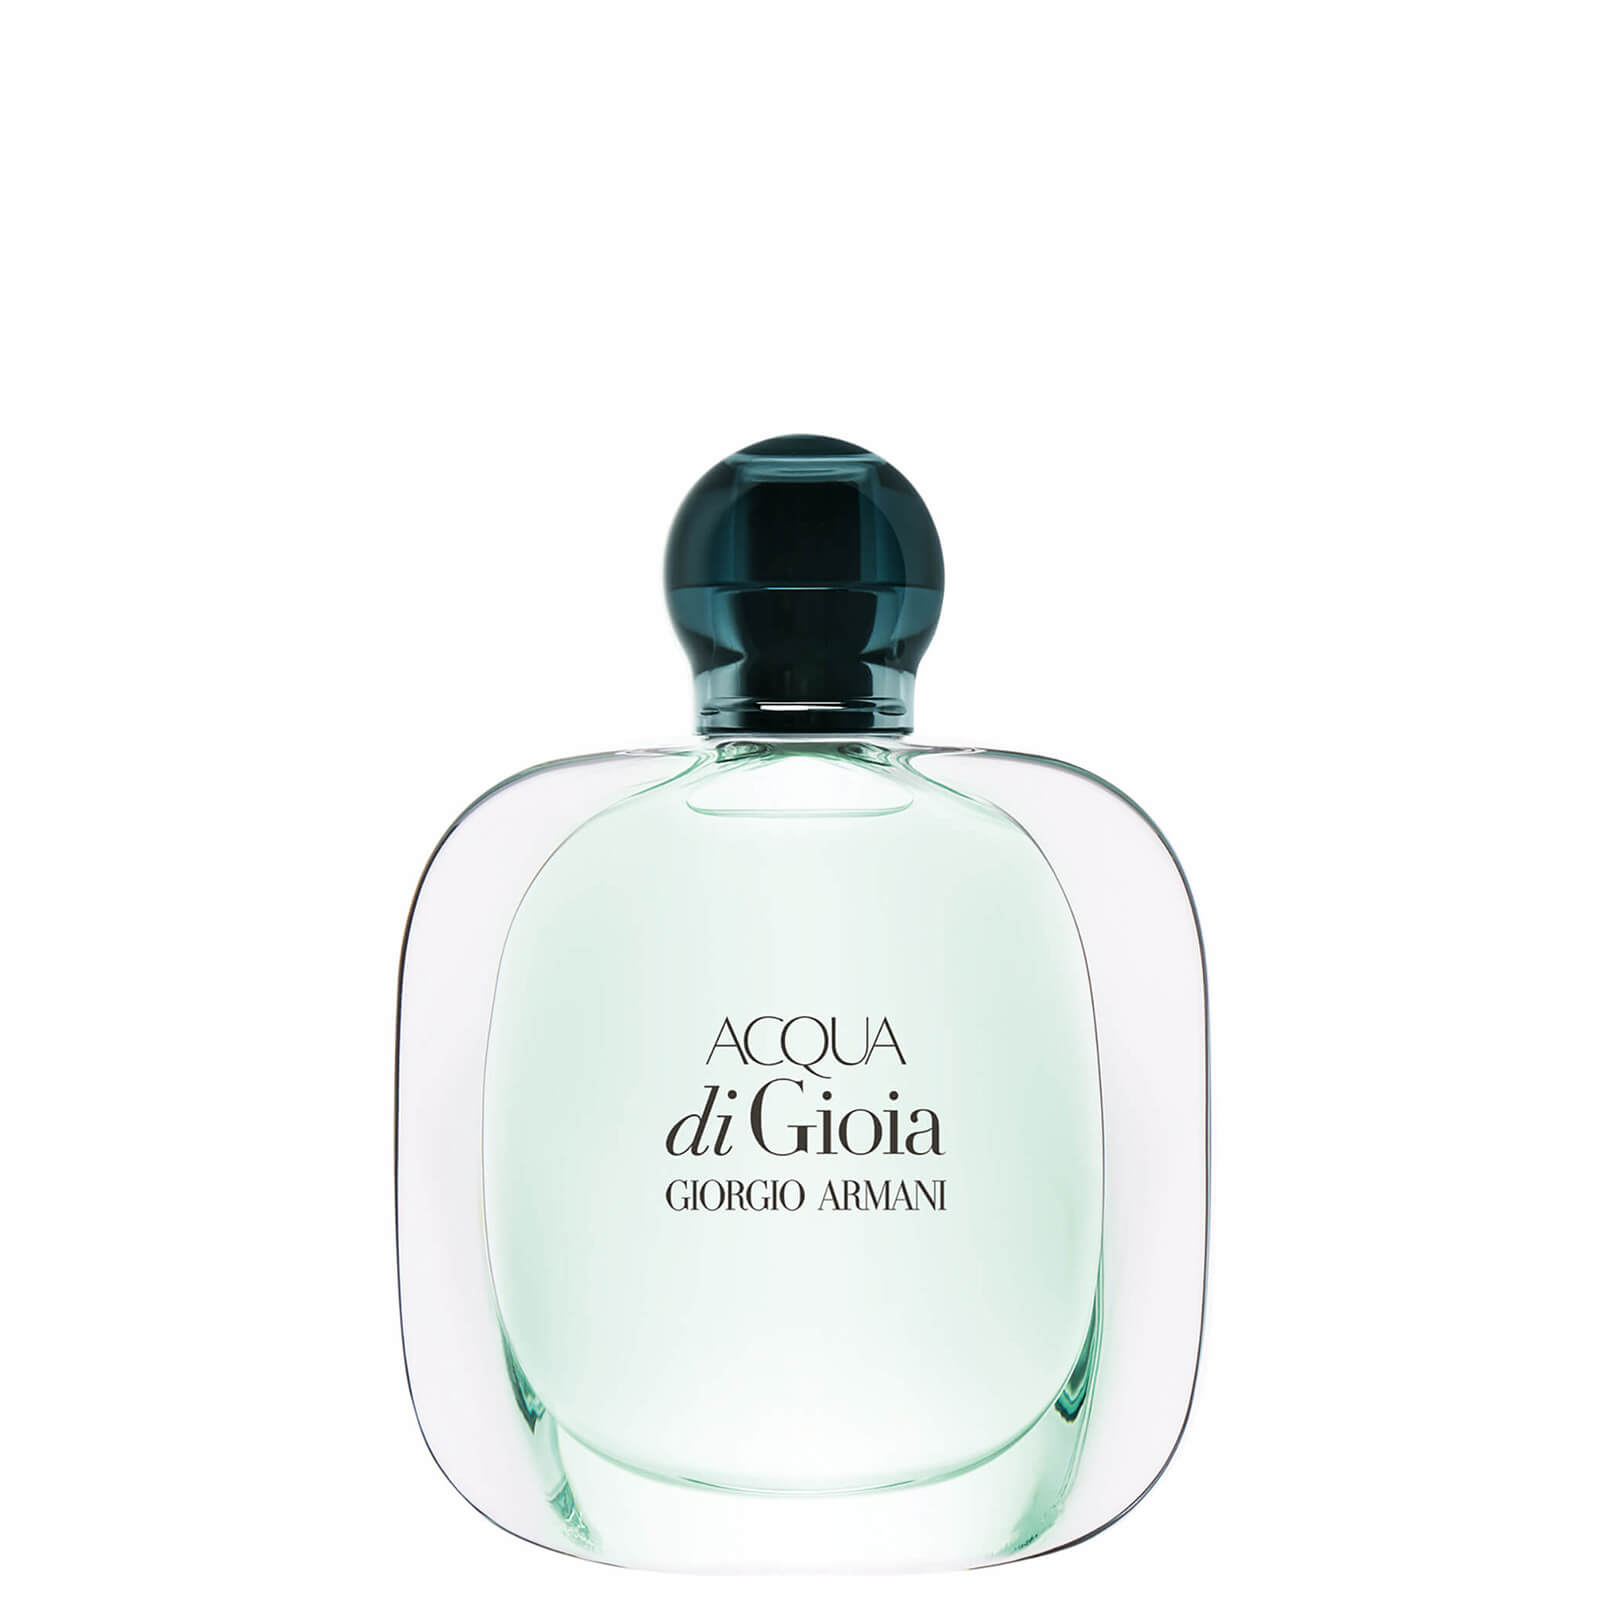 Image of Armani Acqua Di Gioia Eau de Parfum (Various Sizes) - 30ml